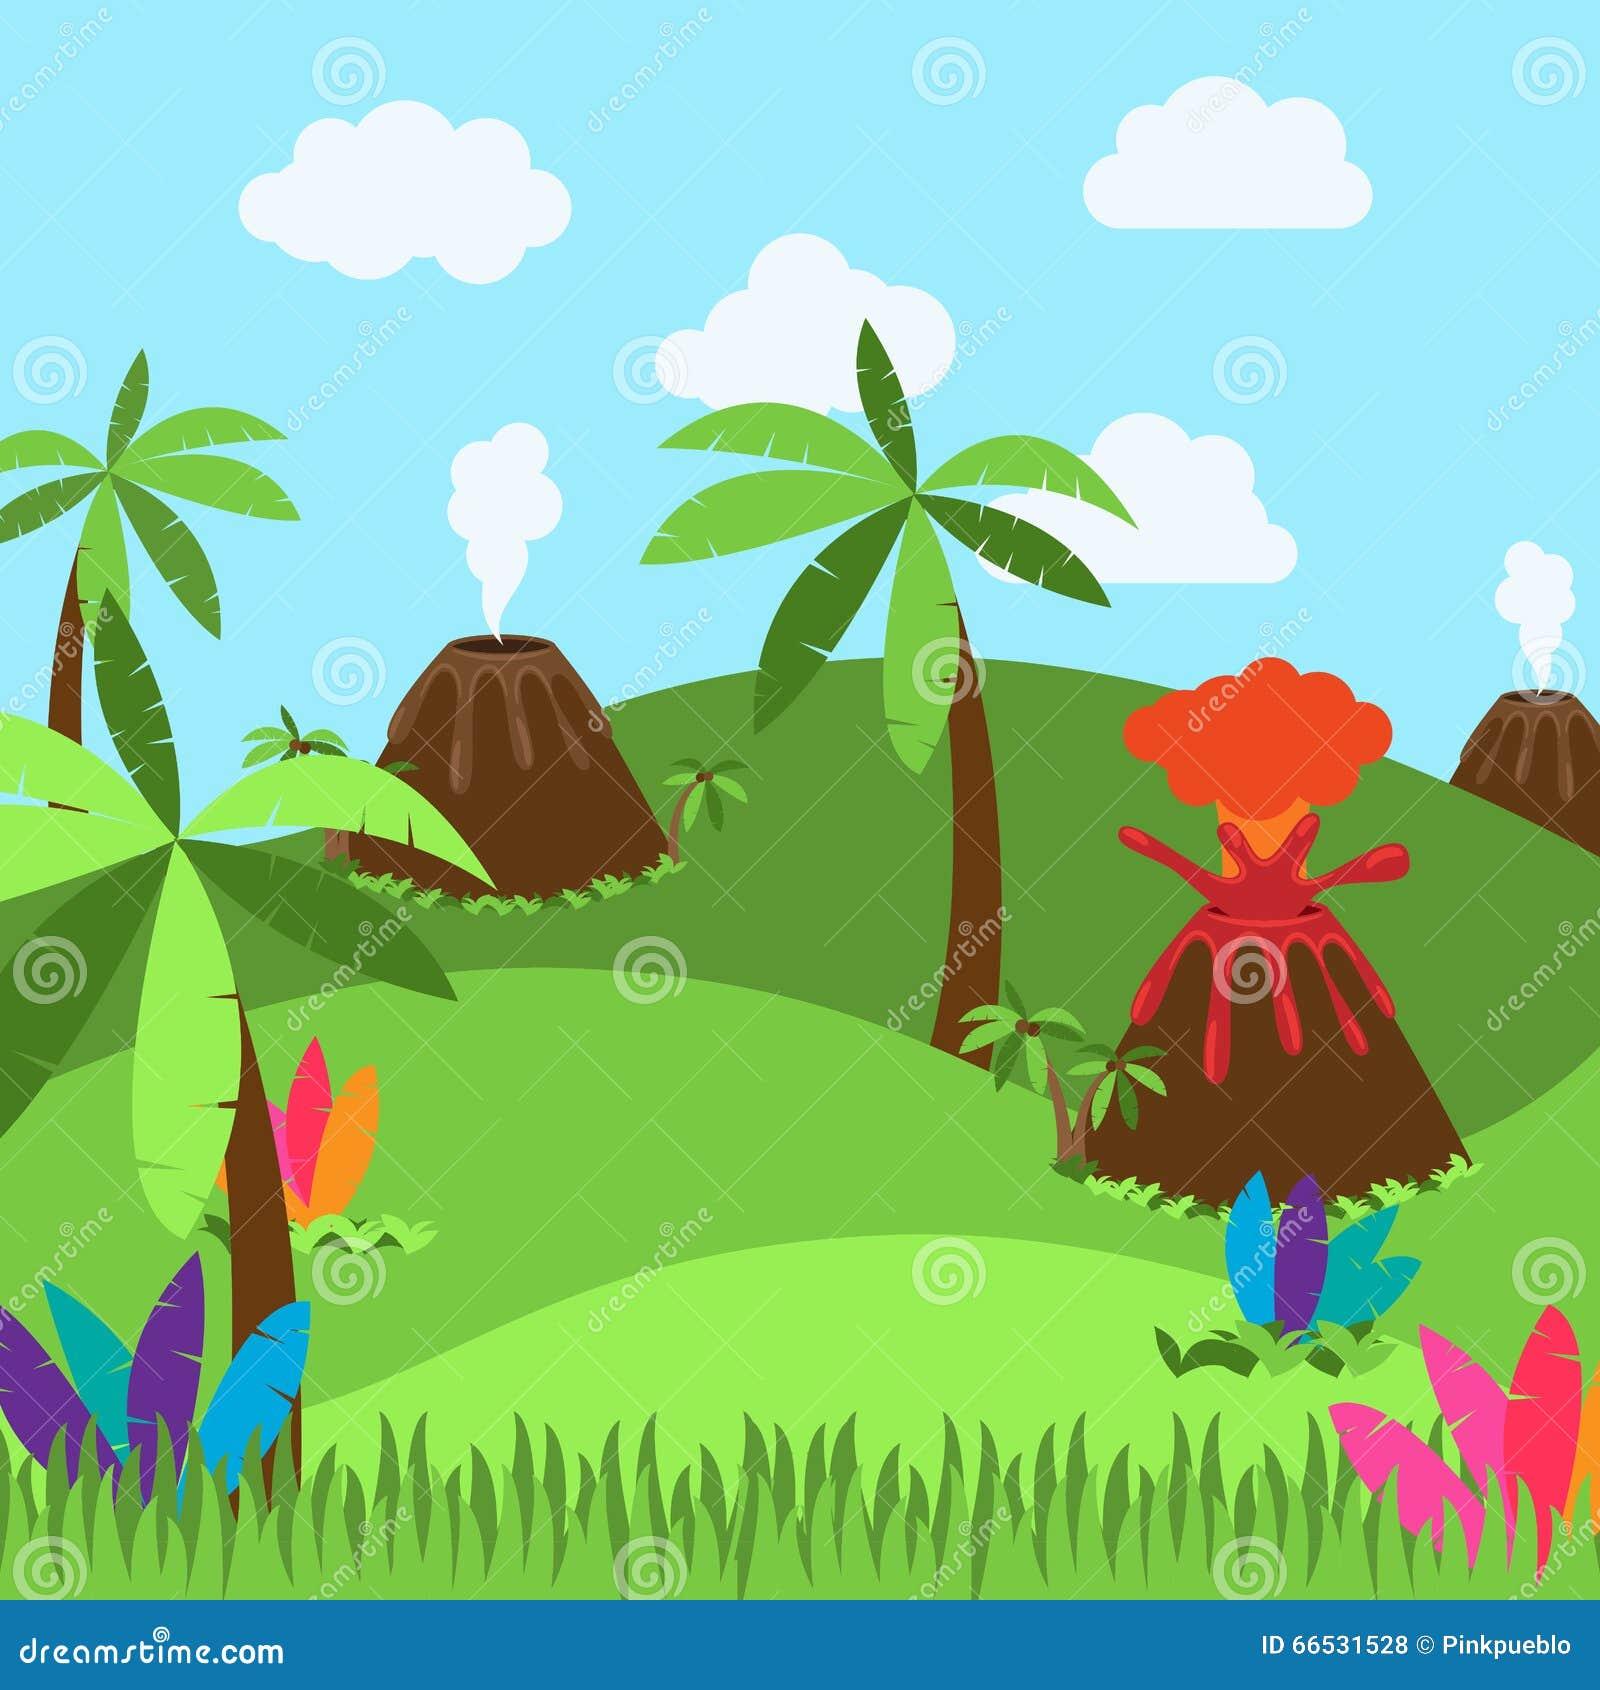 Dinosaur Or Prehistoric Background In Vector Format Stock ...